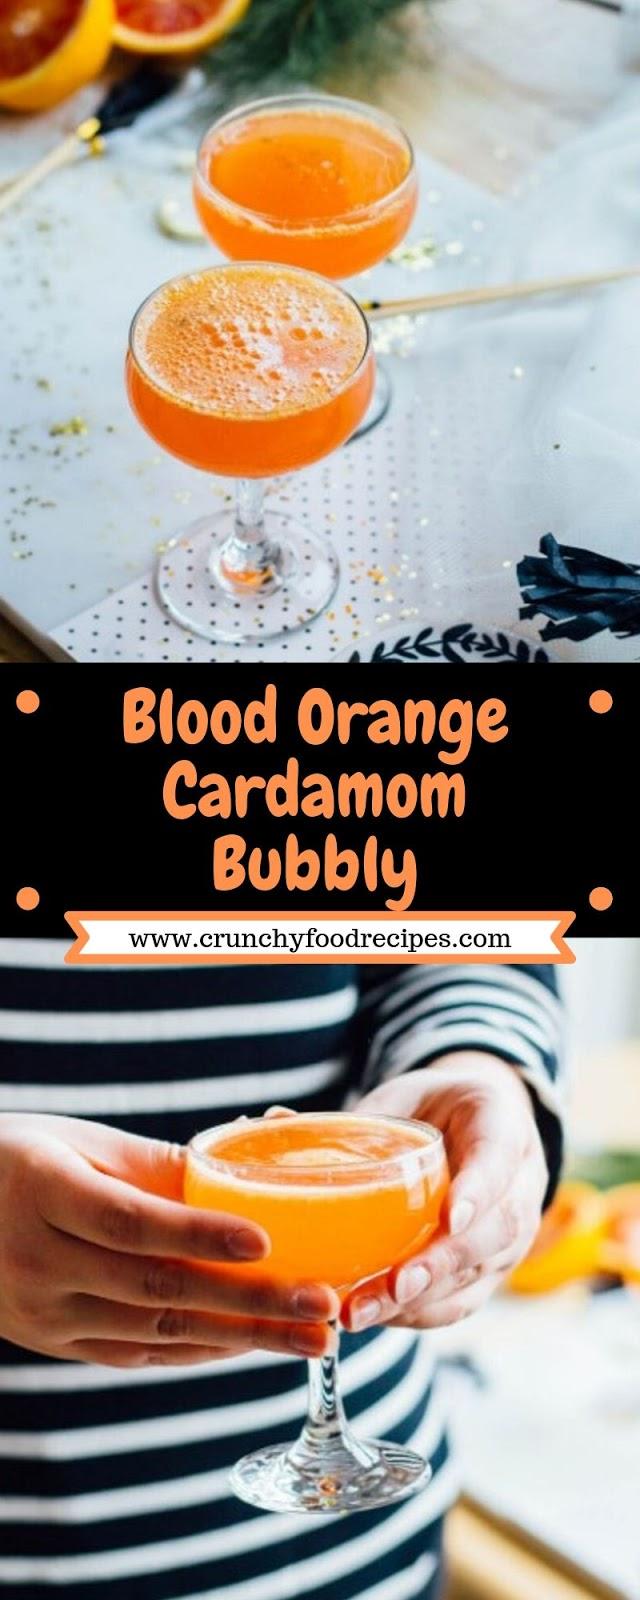 Blood Orange Cardamom Bubbly